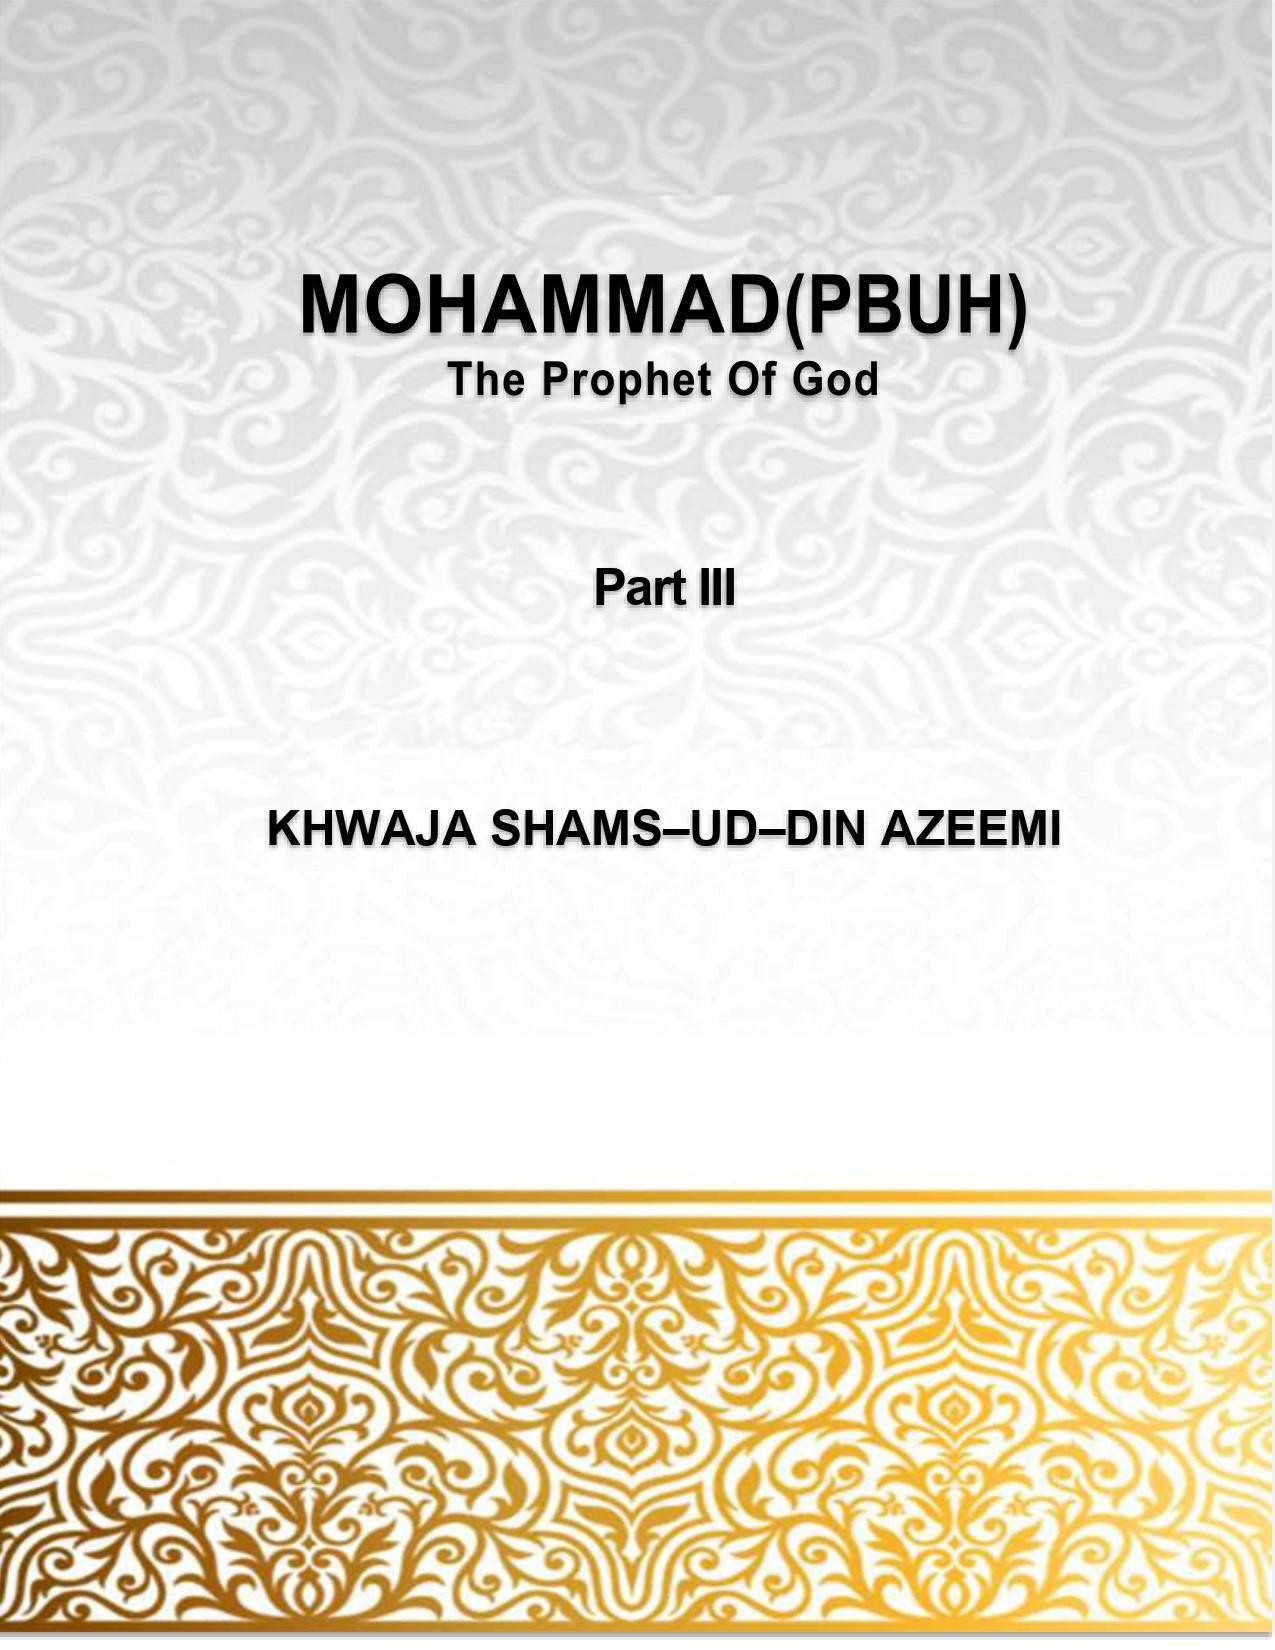 MOHAMMAD (PBUH) The Prophet Of God Part (III)